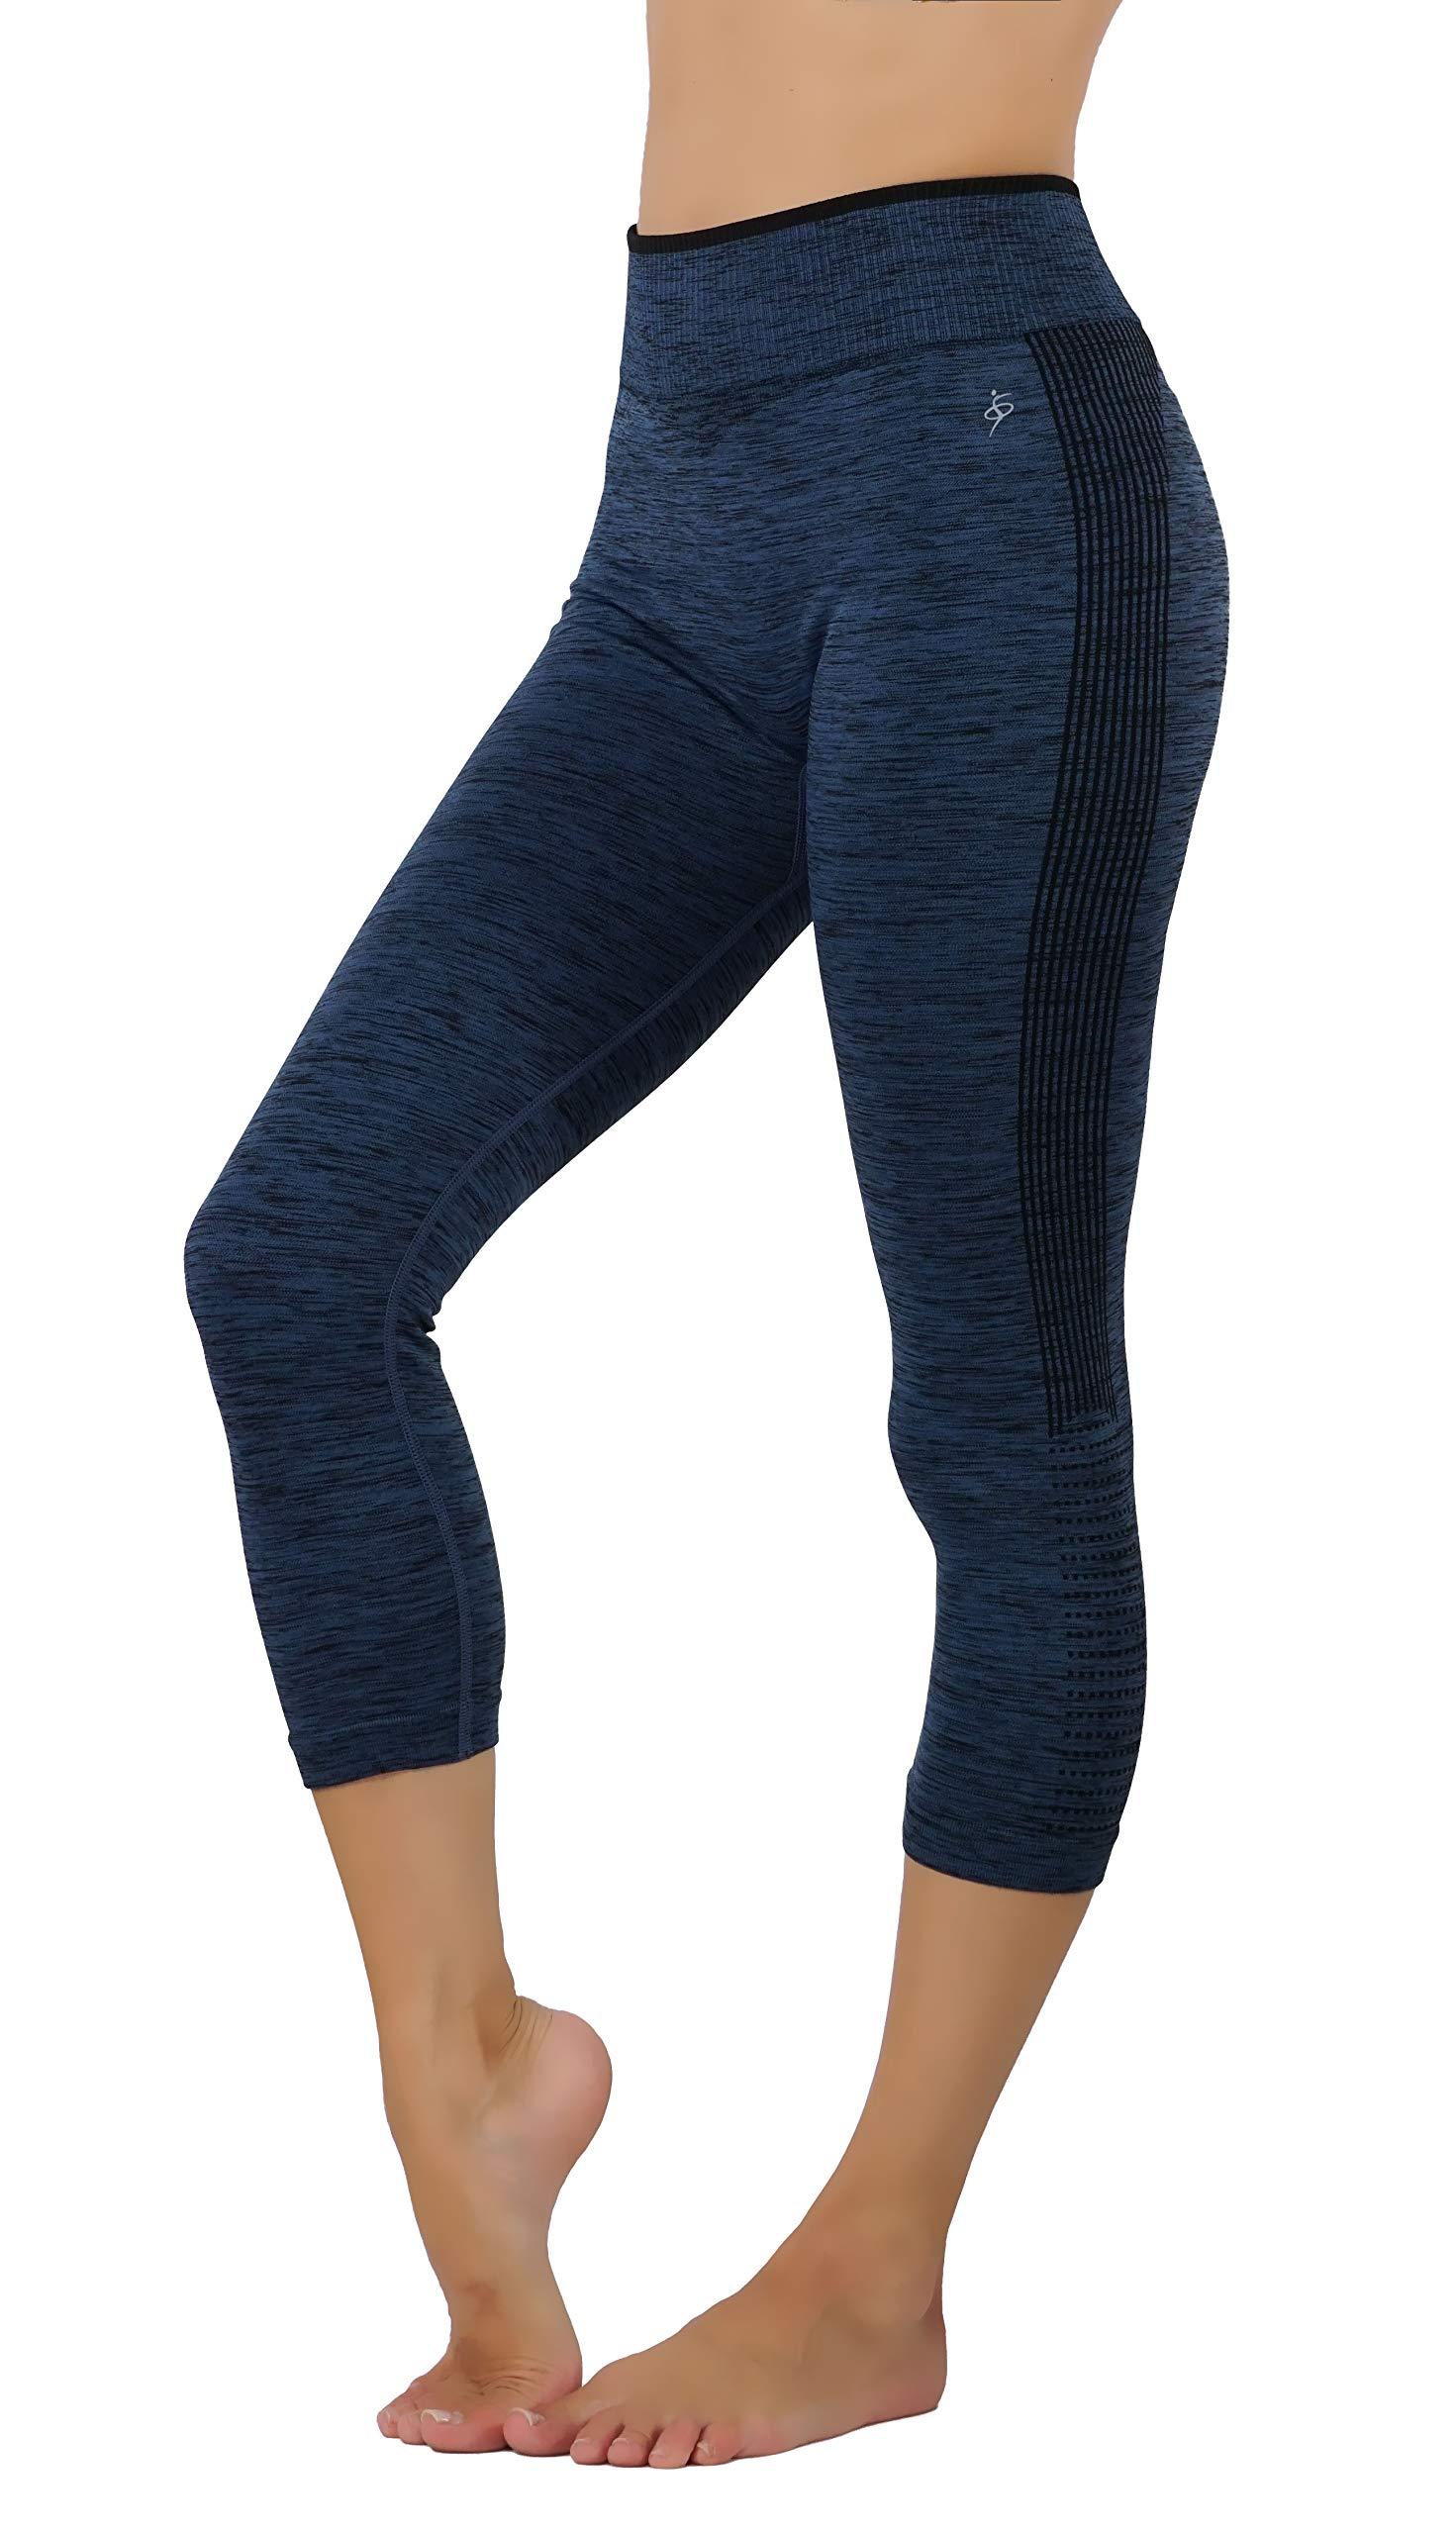 Womens Yoga Pants Workout Leggings Printed Ombte (L/XL US Size 8-12, YGC604-DBL)